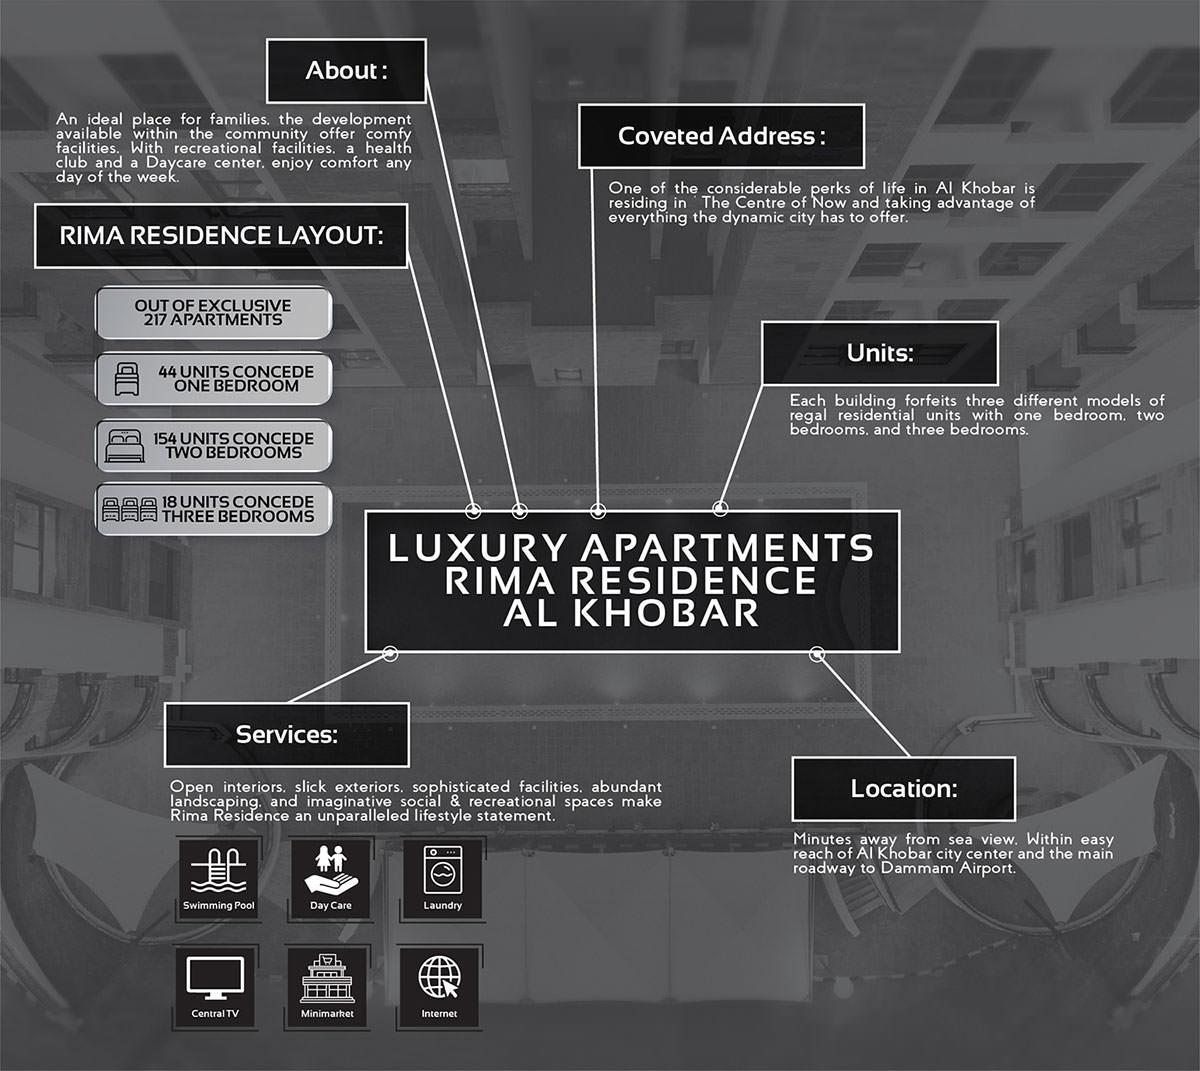 Apartments for Rent in Al Khobar - Rent a Flat in Al Khobar   Rima Residence